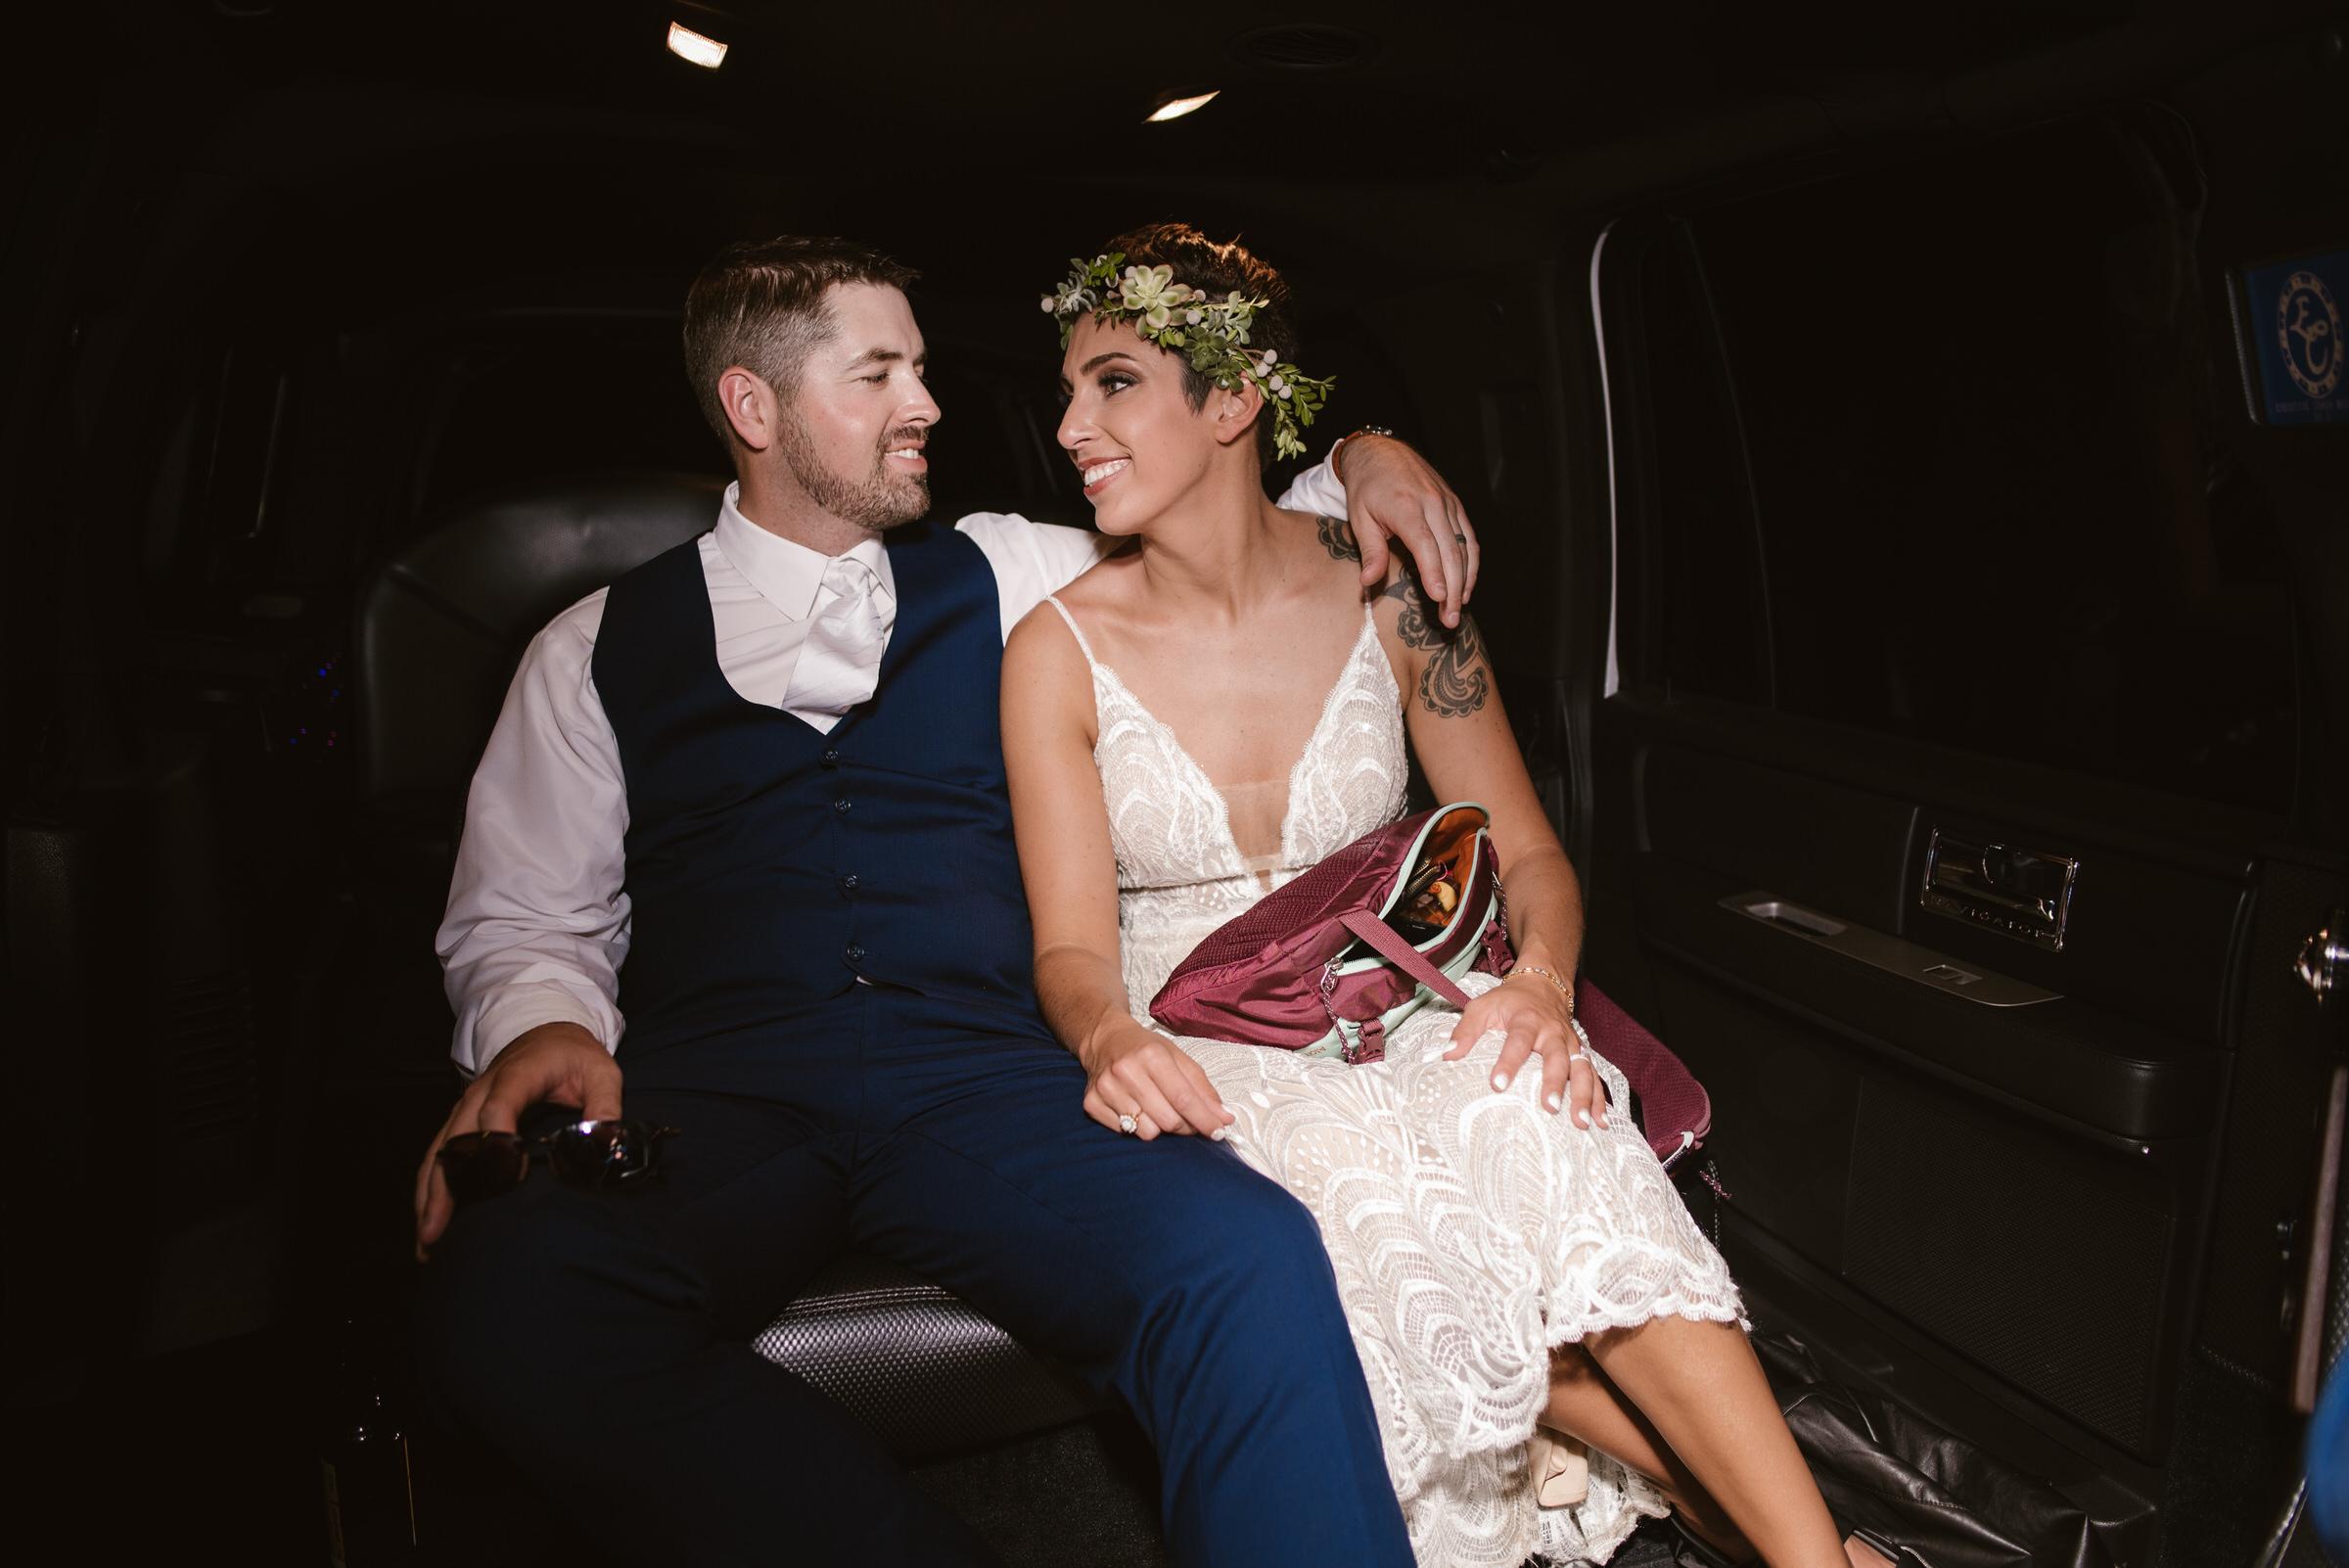 Wilderness-Ridge-Lincoln-Nebraska-Wedding-Kaylie-Sirek-Photography-136.jpg